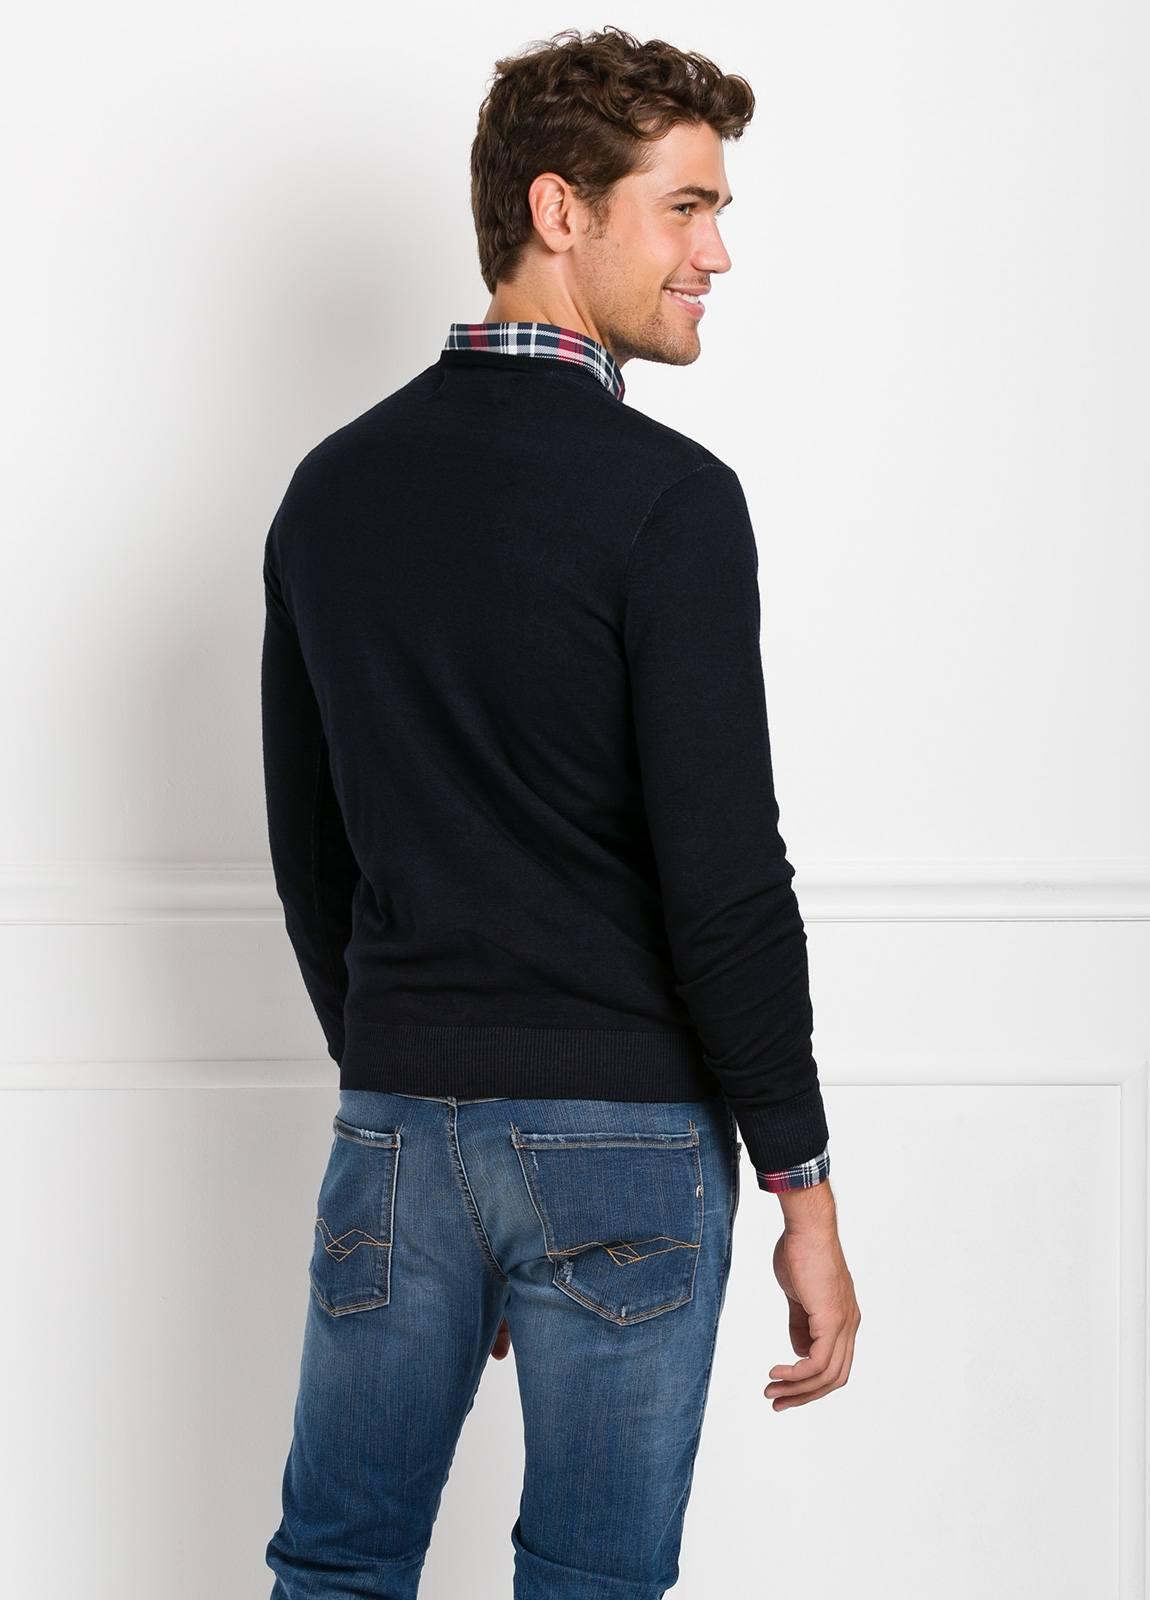 Suéter manga larga, cuello pico, color azul marino. 100% Lana. - Ítem2